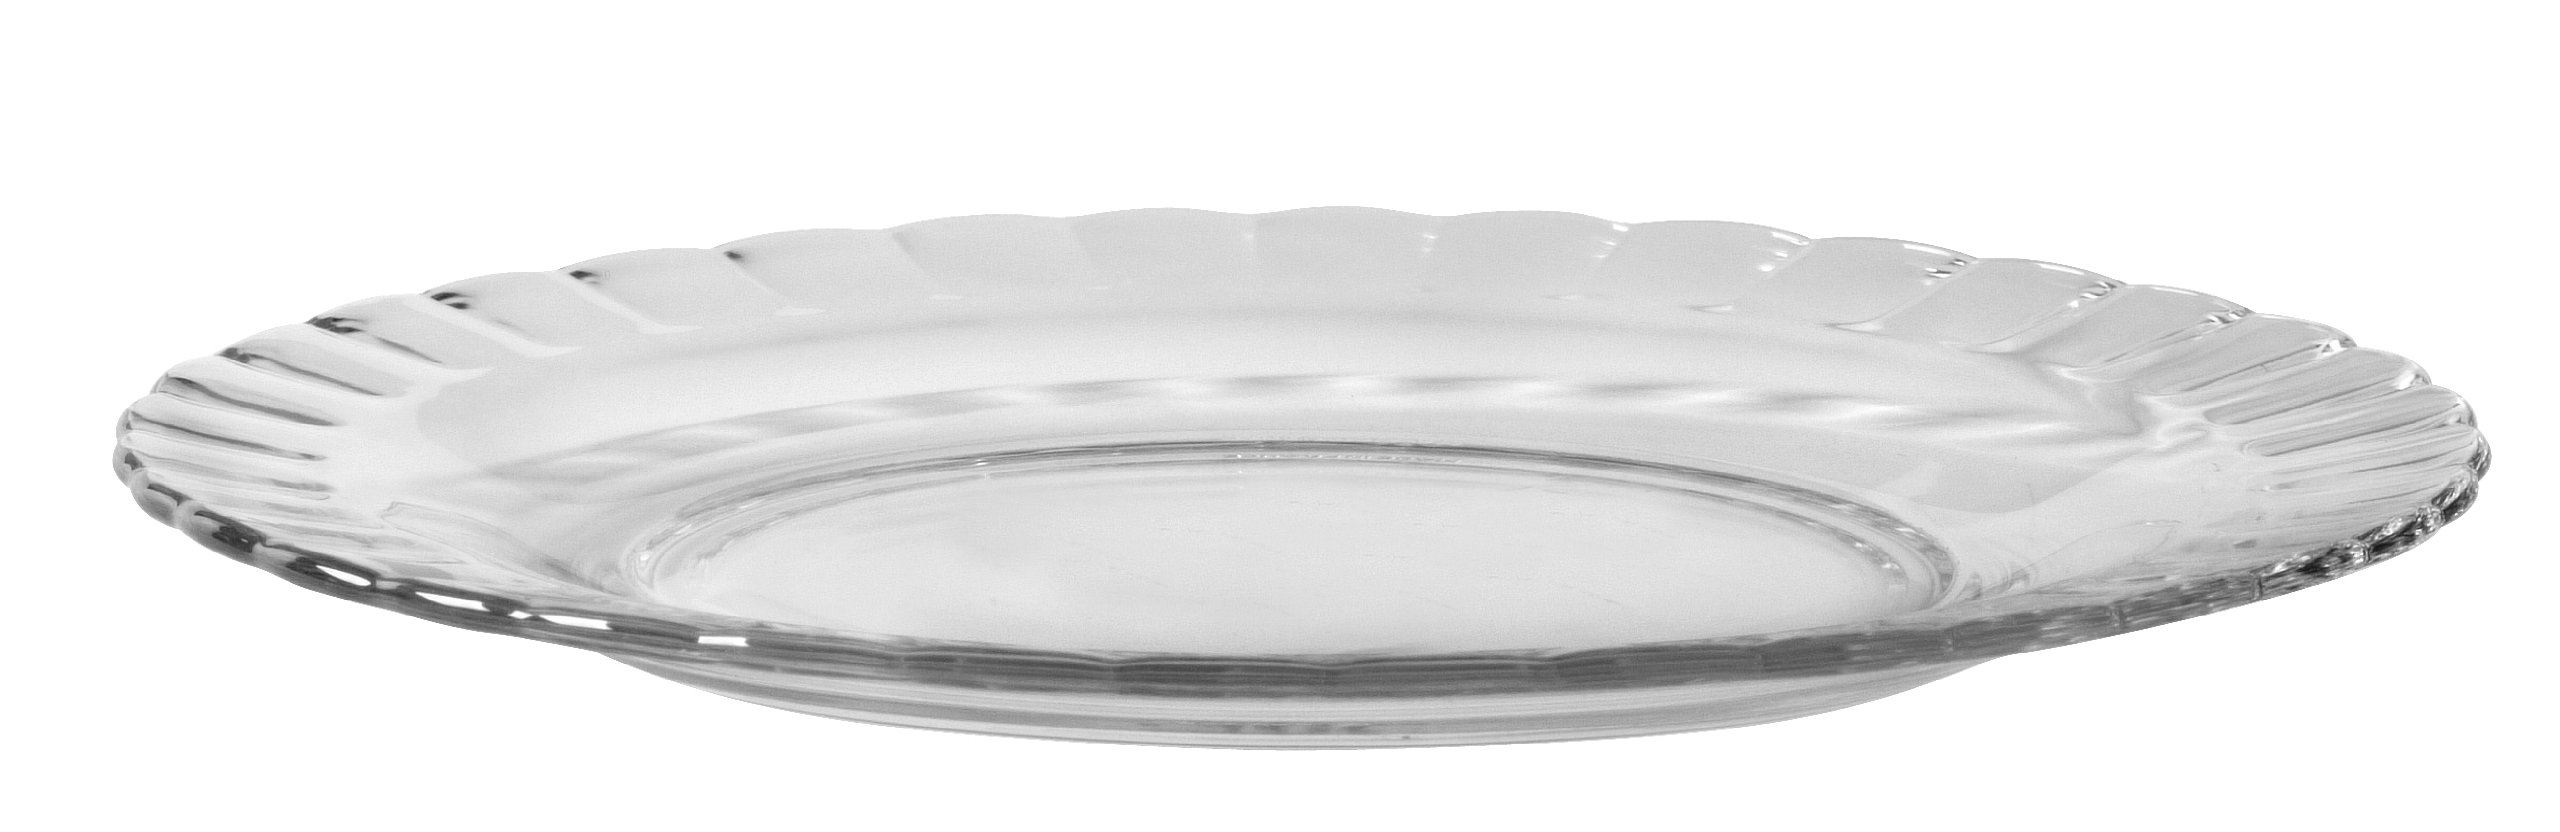 Duralex - Paris Clear Dessert Plate 20,5 cm 8 1/8'' s/6